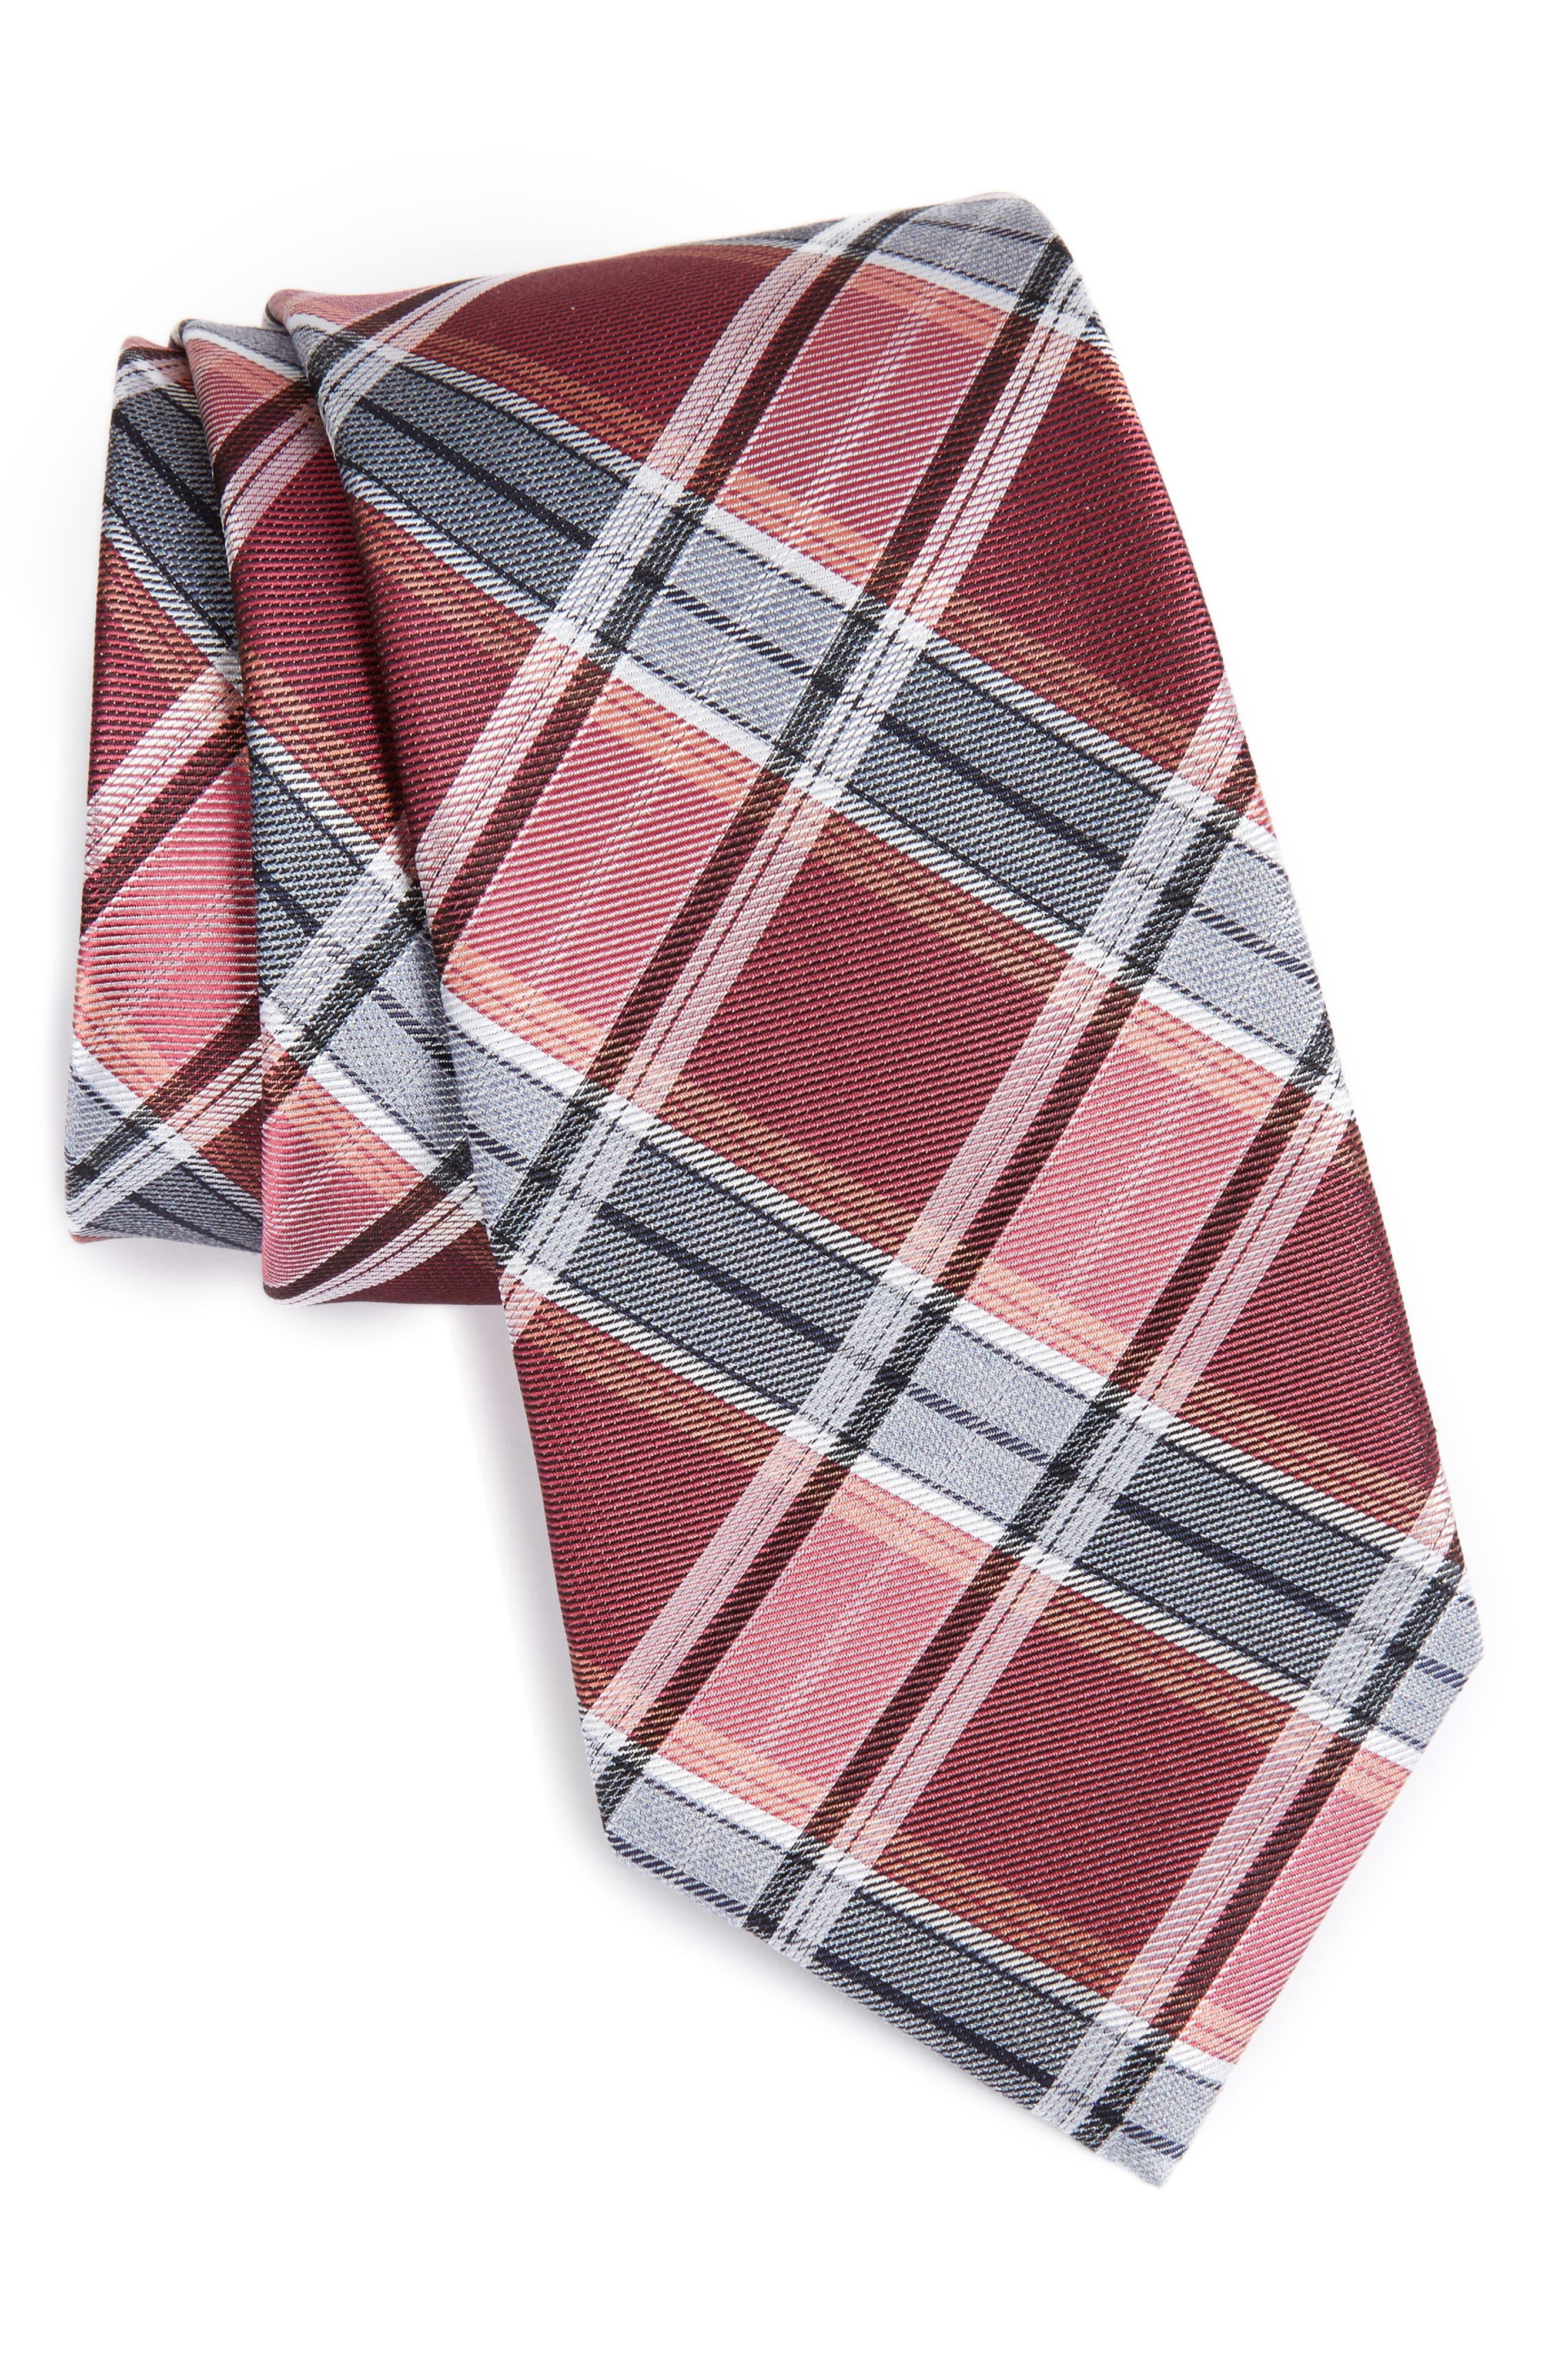 CALIBRATE Schoolboy Plaid Silk Blend Skinny Tie